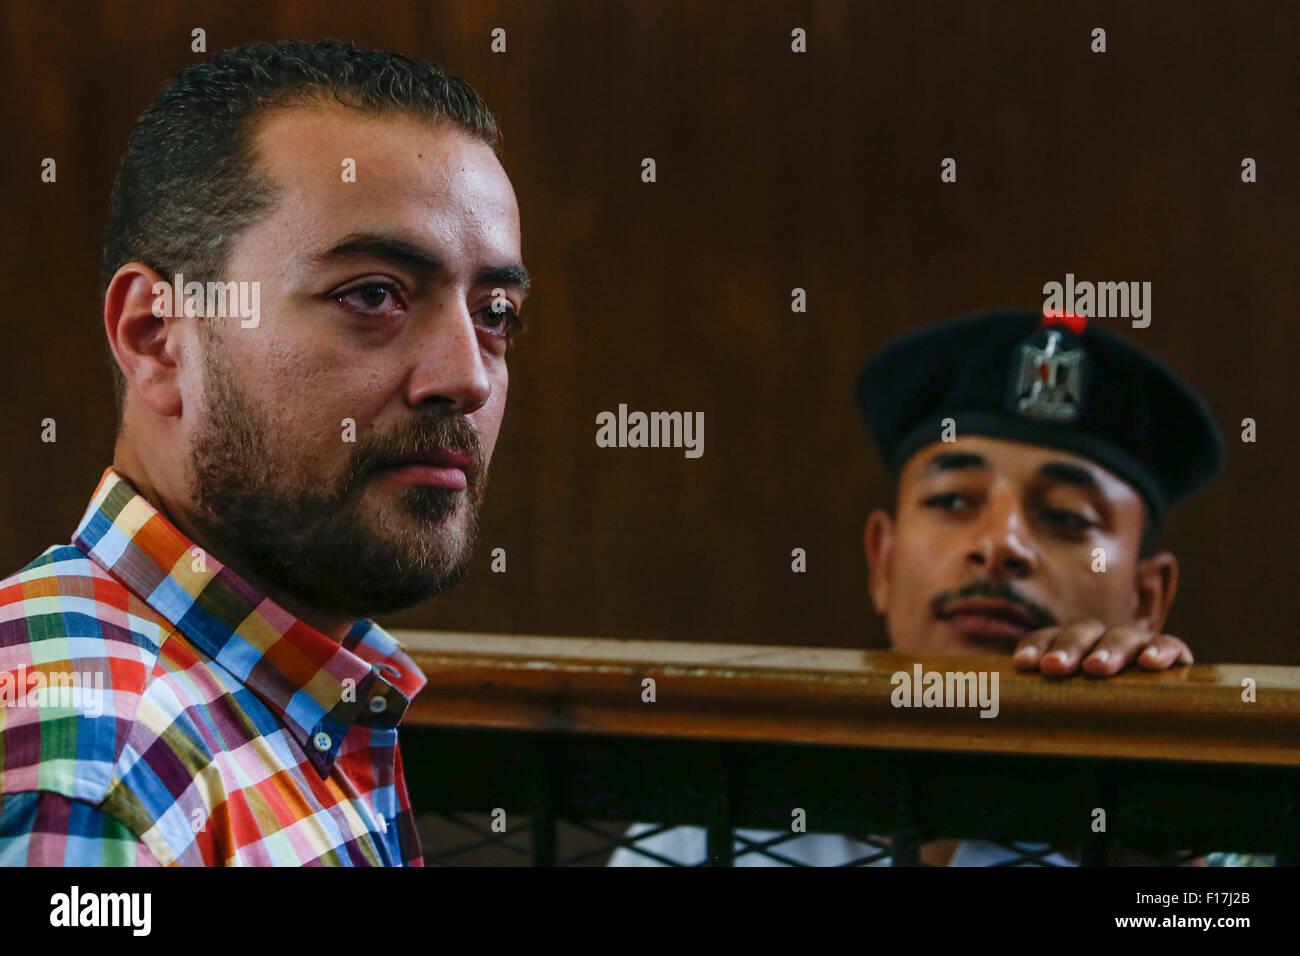 Cairo, Egypt. 29th Aug, 2015. Egyptian Al-Jazeera English journalist Baher Mohammed looks on before his verdict - Stock Image